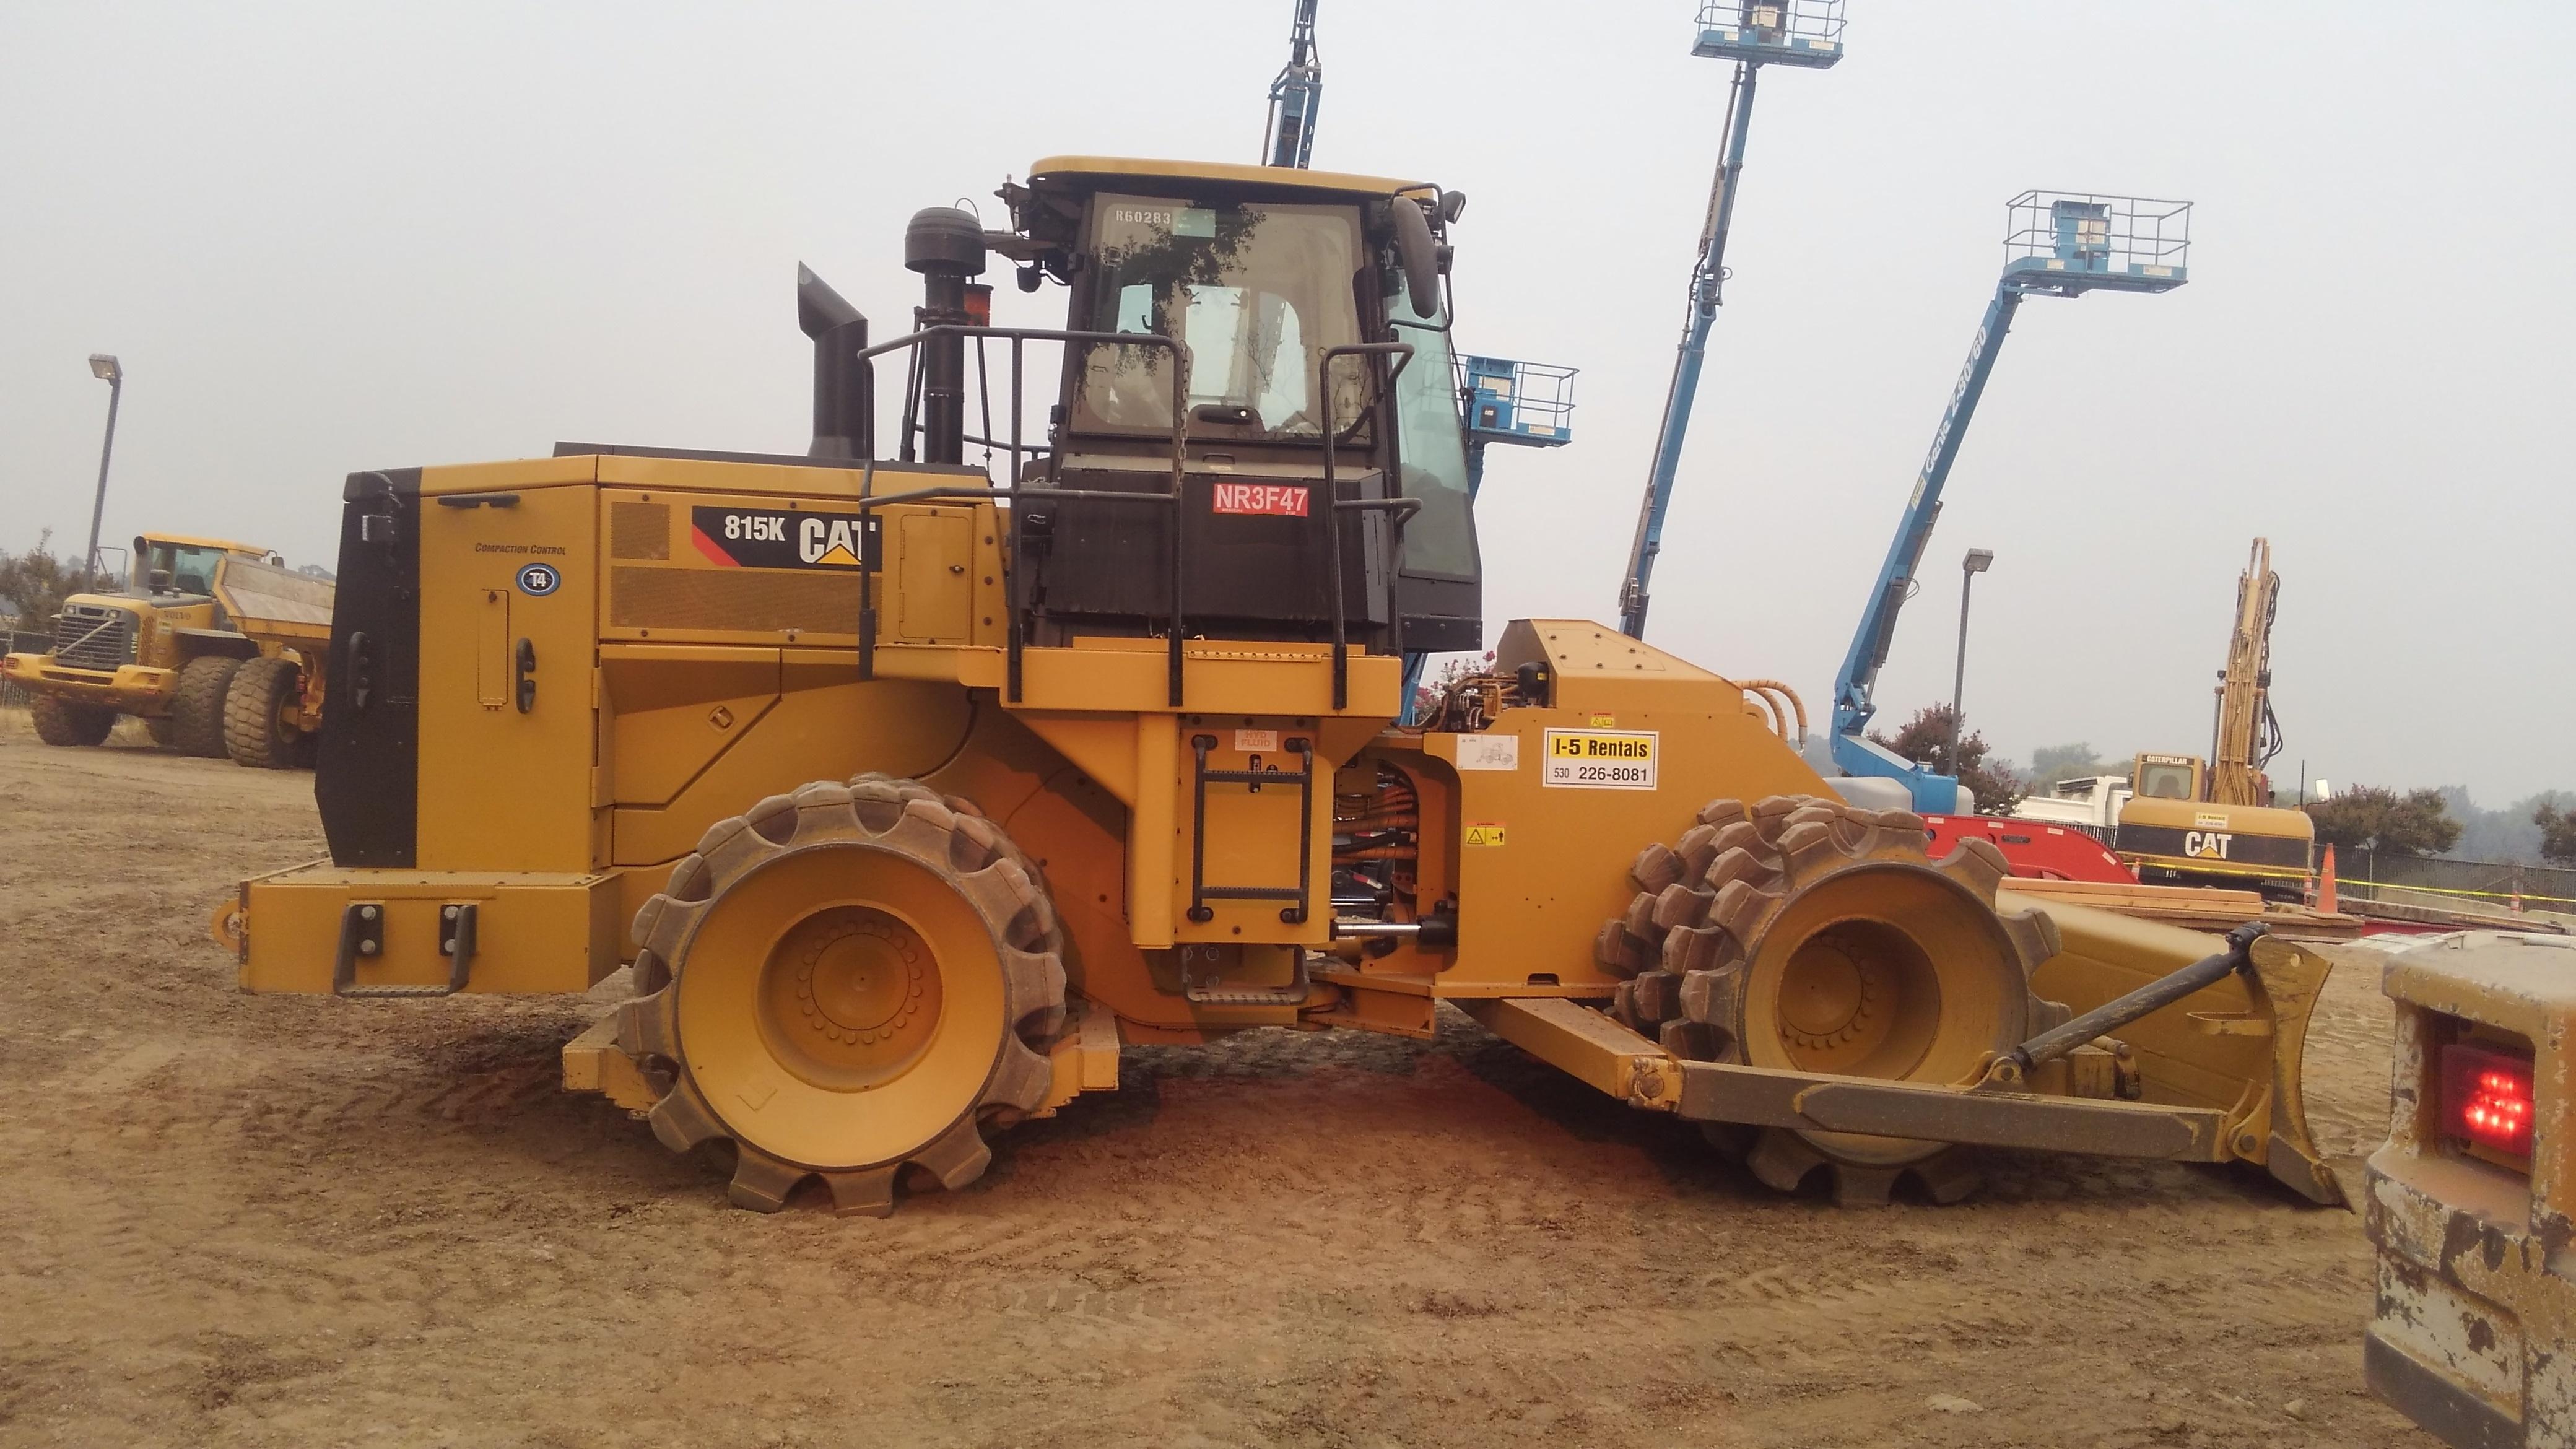 SOIL COMPACTOR 815K